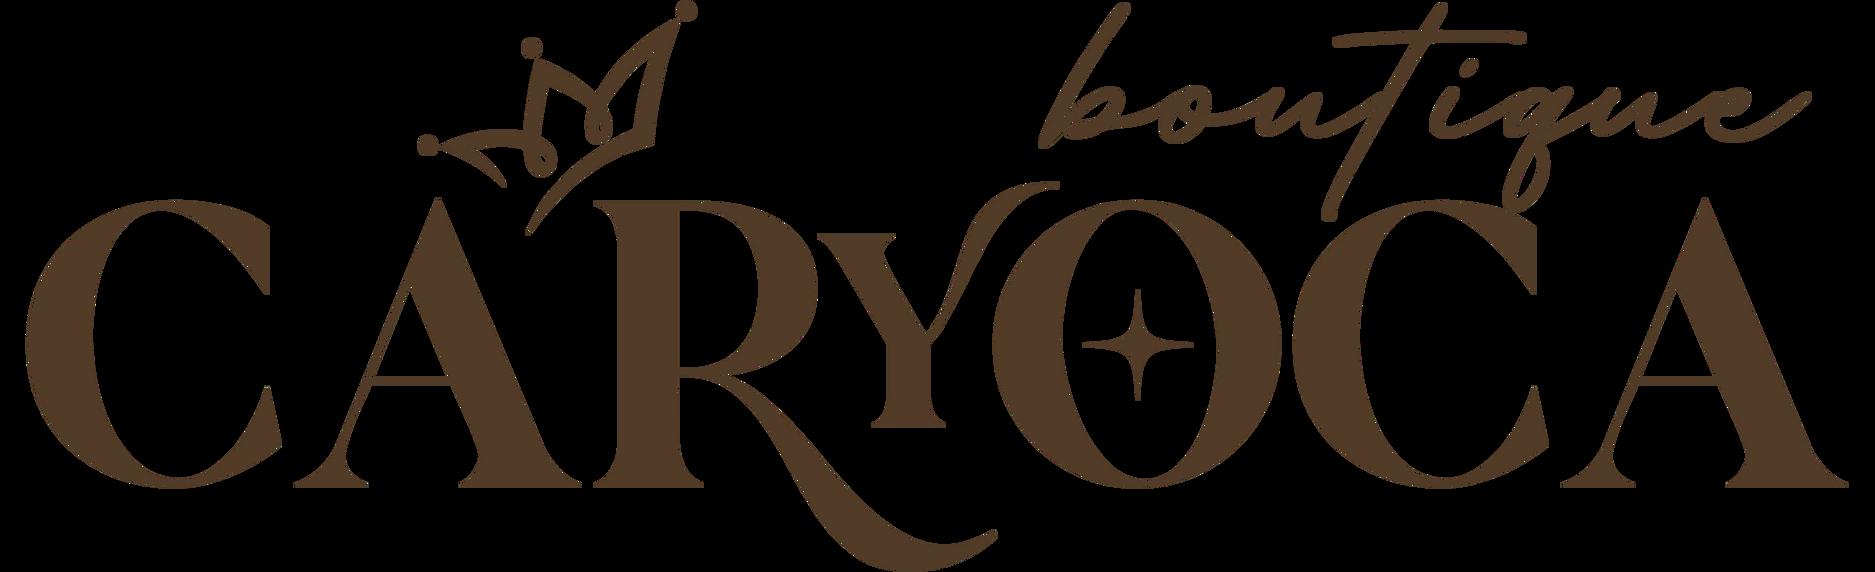 Caryoca Boutique